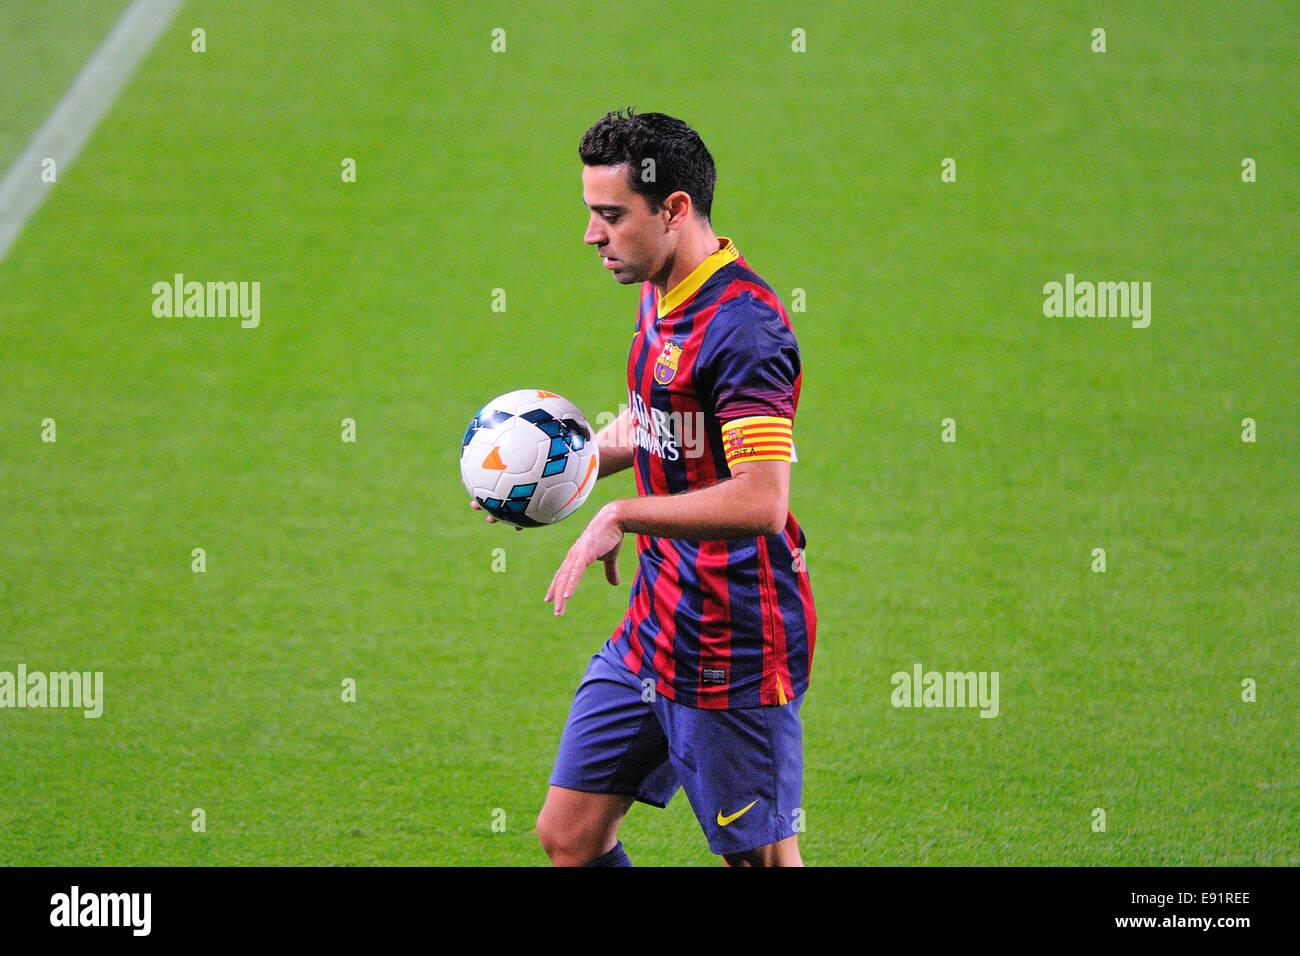 BARCELONA - APR 21: Xavi Hernandez, F.C Barcelona player, in action against Athletic Bilbao at the Camp Nou Stadium. - Stock Image